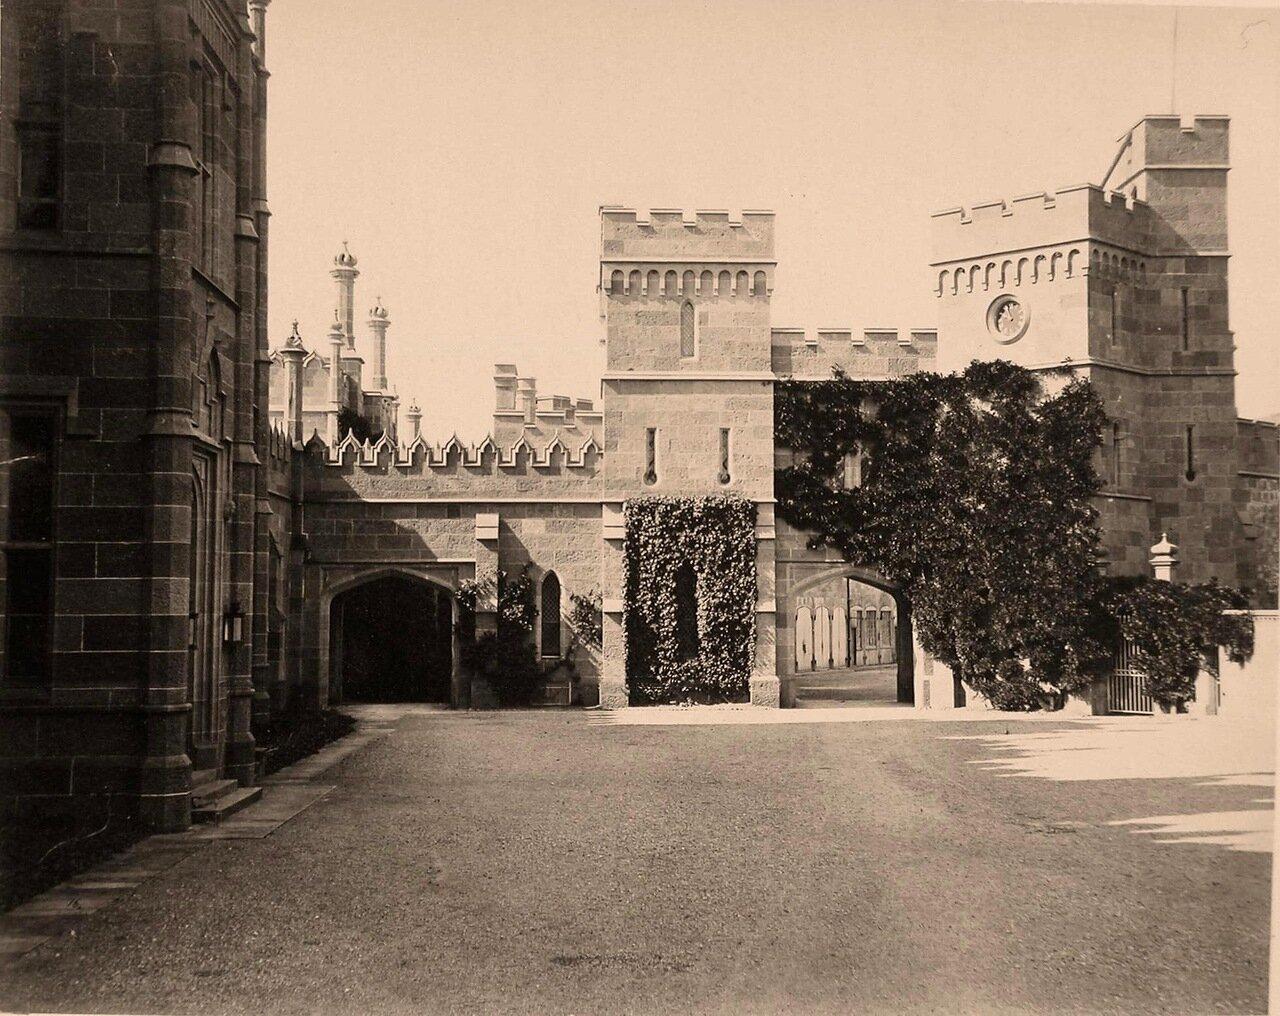 Вид части фасада дворца графа М.С.Воронцова со стороны двора; (архитектор Эдуард Блор, 1828-1848 гг.)